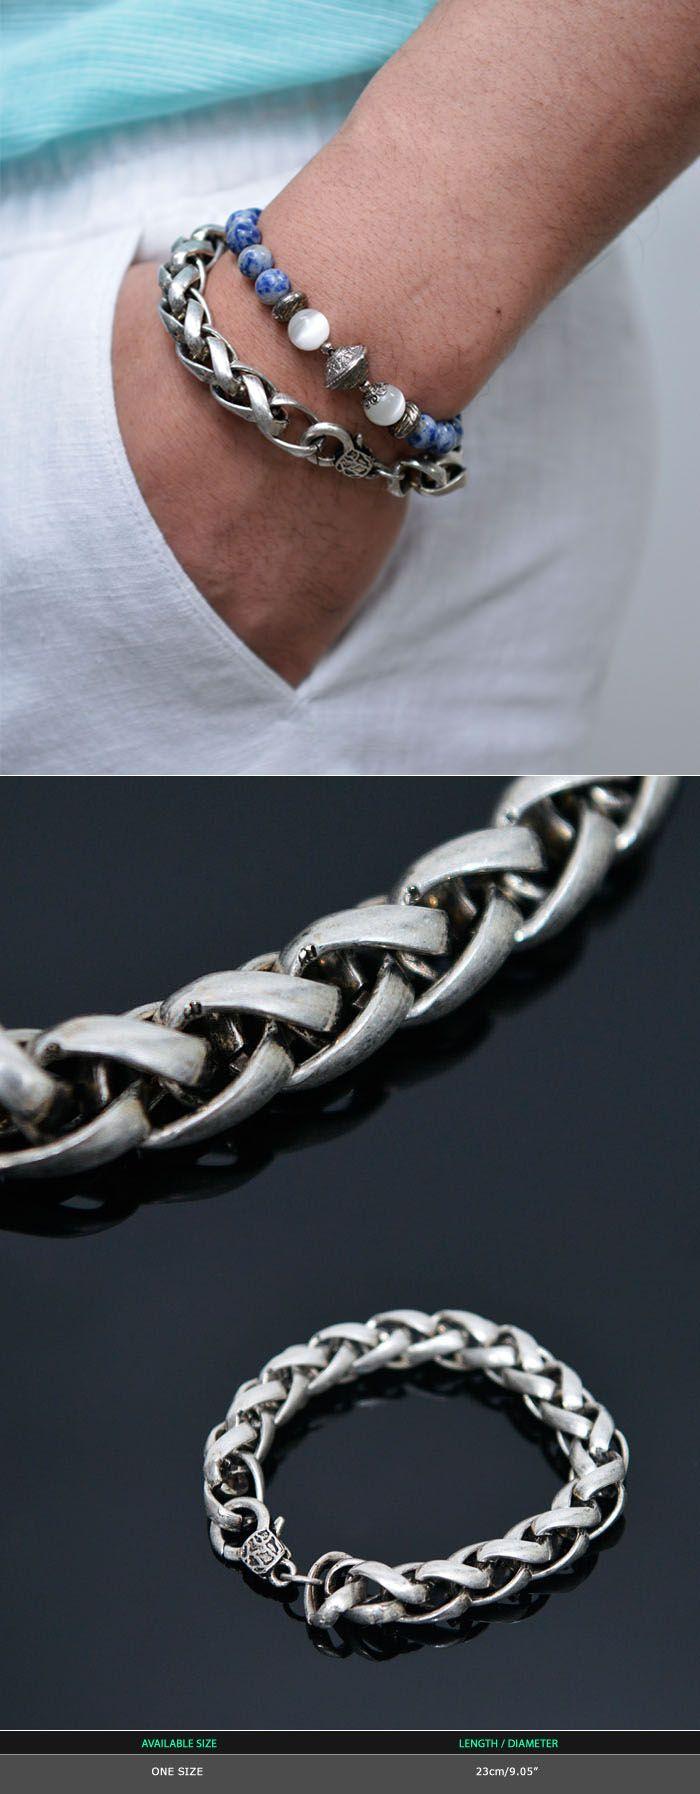 Antique Matt Silver Chain Cuff-Bracelet 350 by Guylook.com